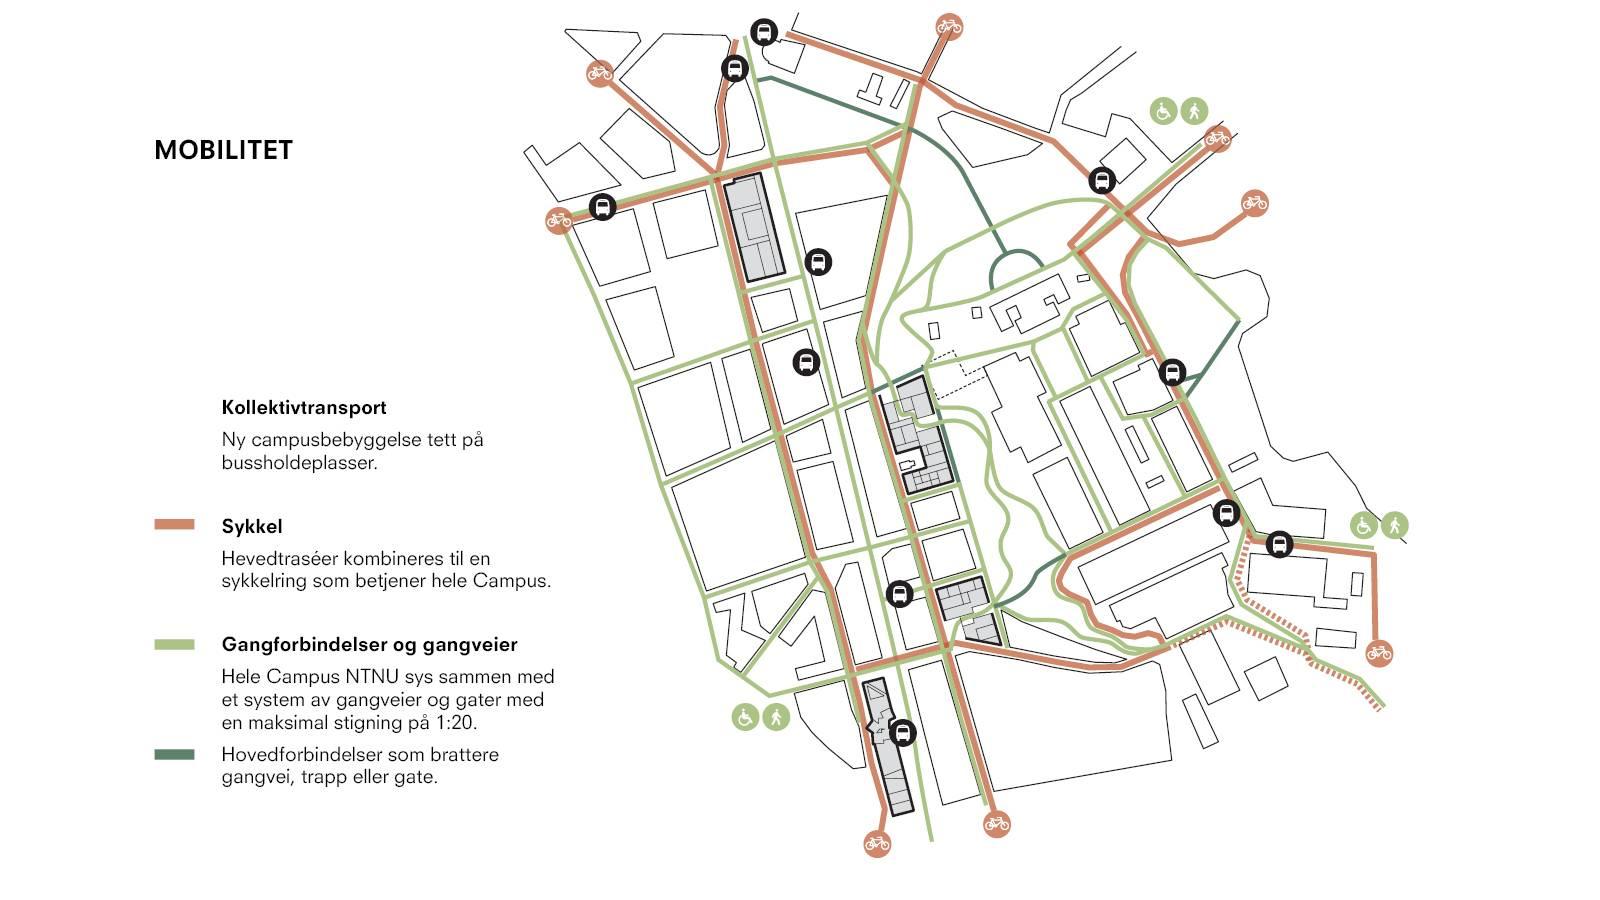 GREEN MOBILITY - NTNU – More Park, More City! - SPOL Architects